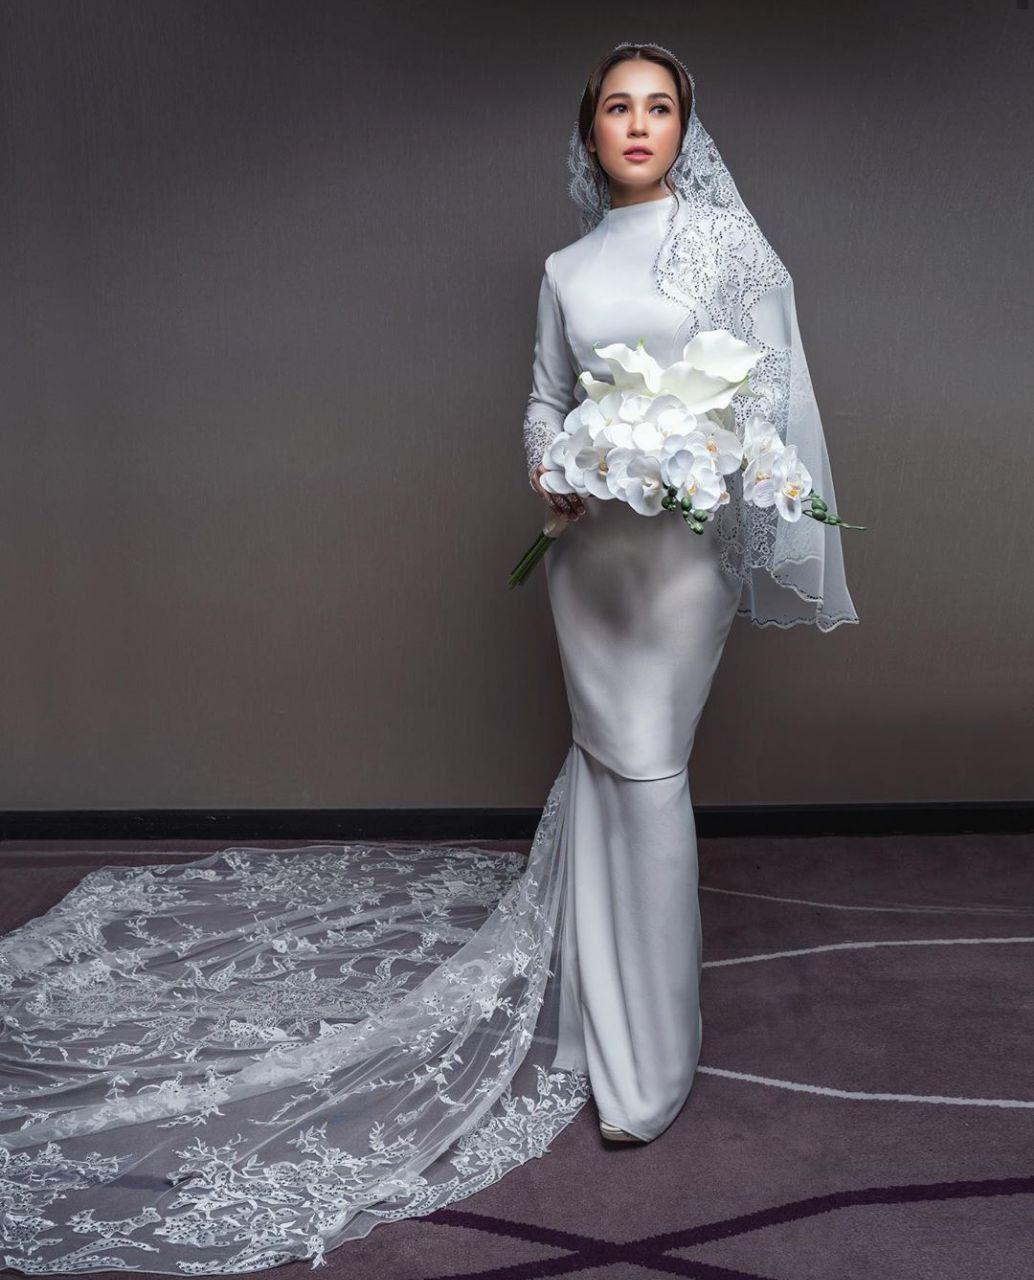 Baju akad nikah emma maembong in 9  Nikah dress, Nikah outfit